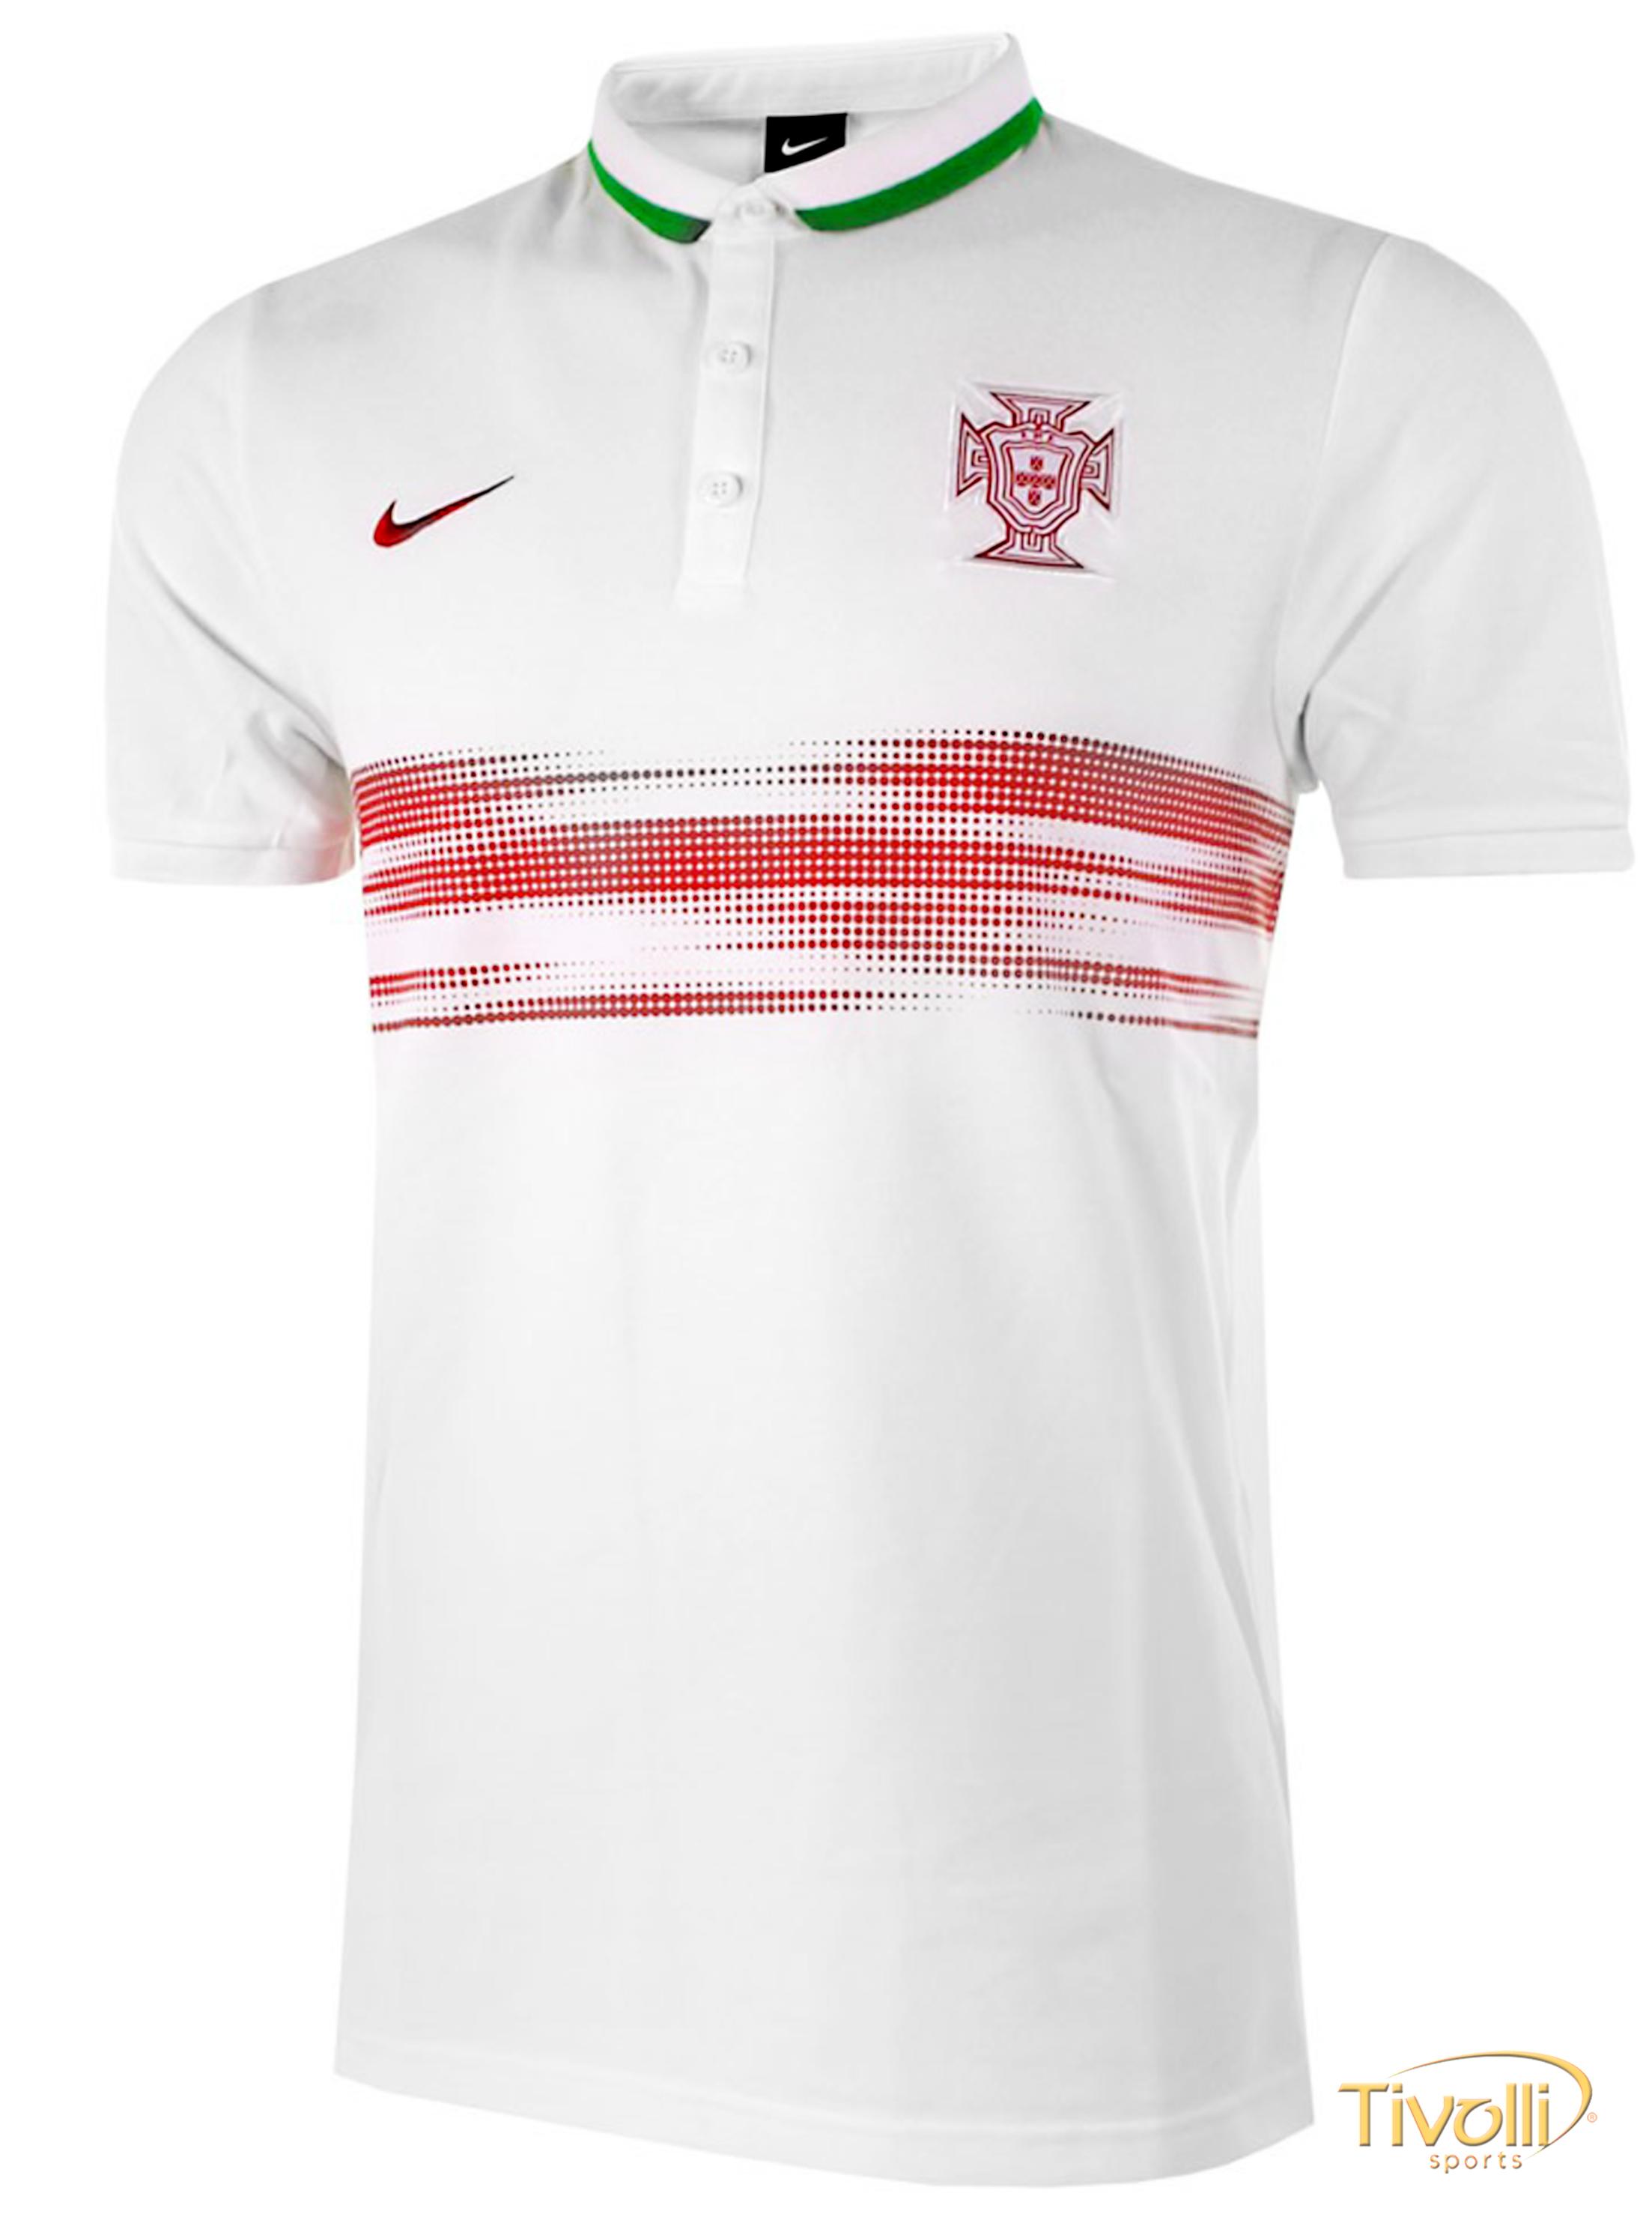 Camisa Polo Portugal Nike 2015 16   - Mega Saldão   5c18e53126ddc